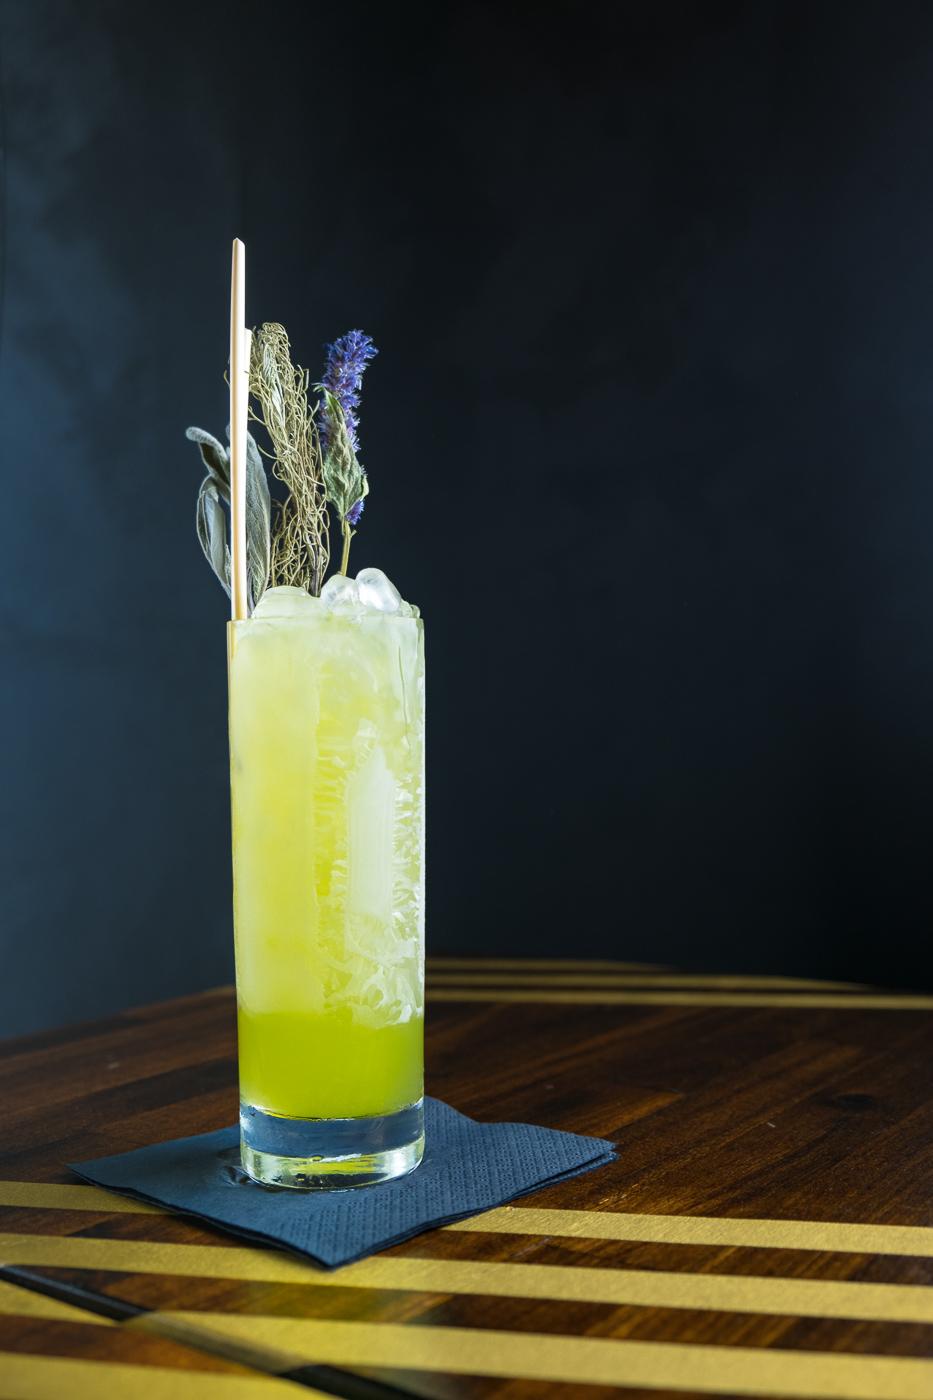 tooktook-photography-gastronomy-food-beverages-experiences-restaurants-127.jpg